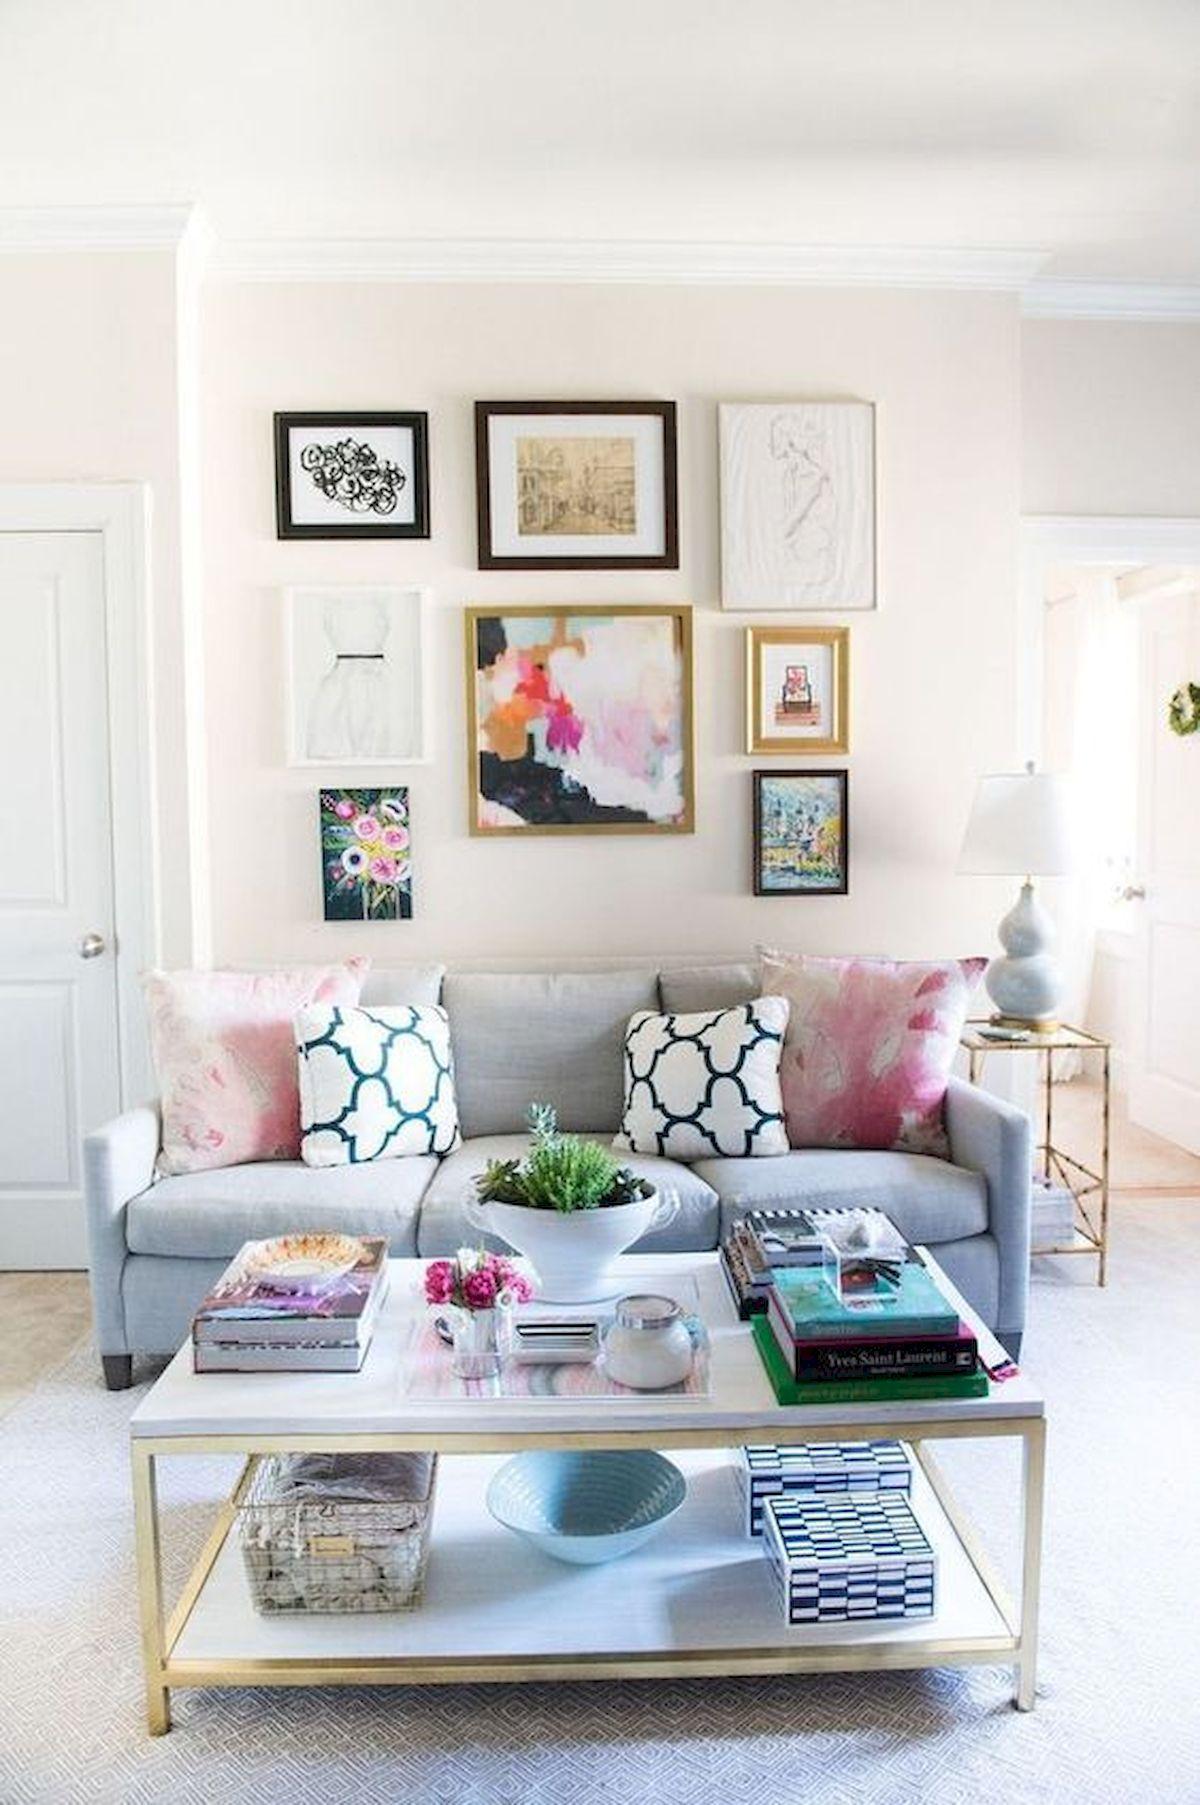 45 Brilliant DIY Living Room Design And Decor Ideas For Small Apartment (18)